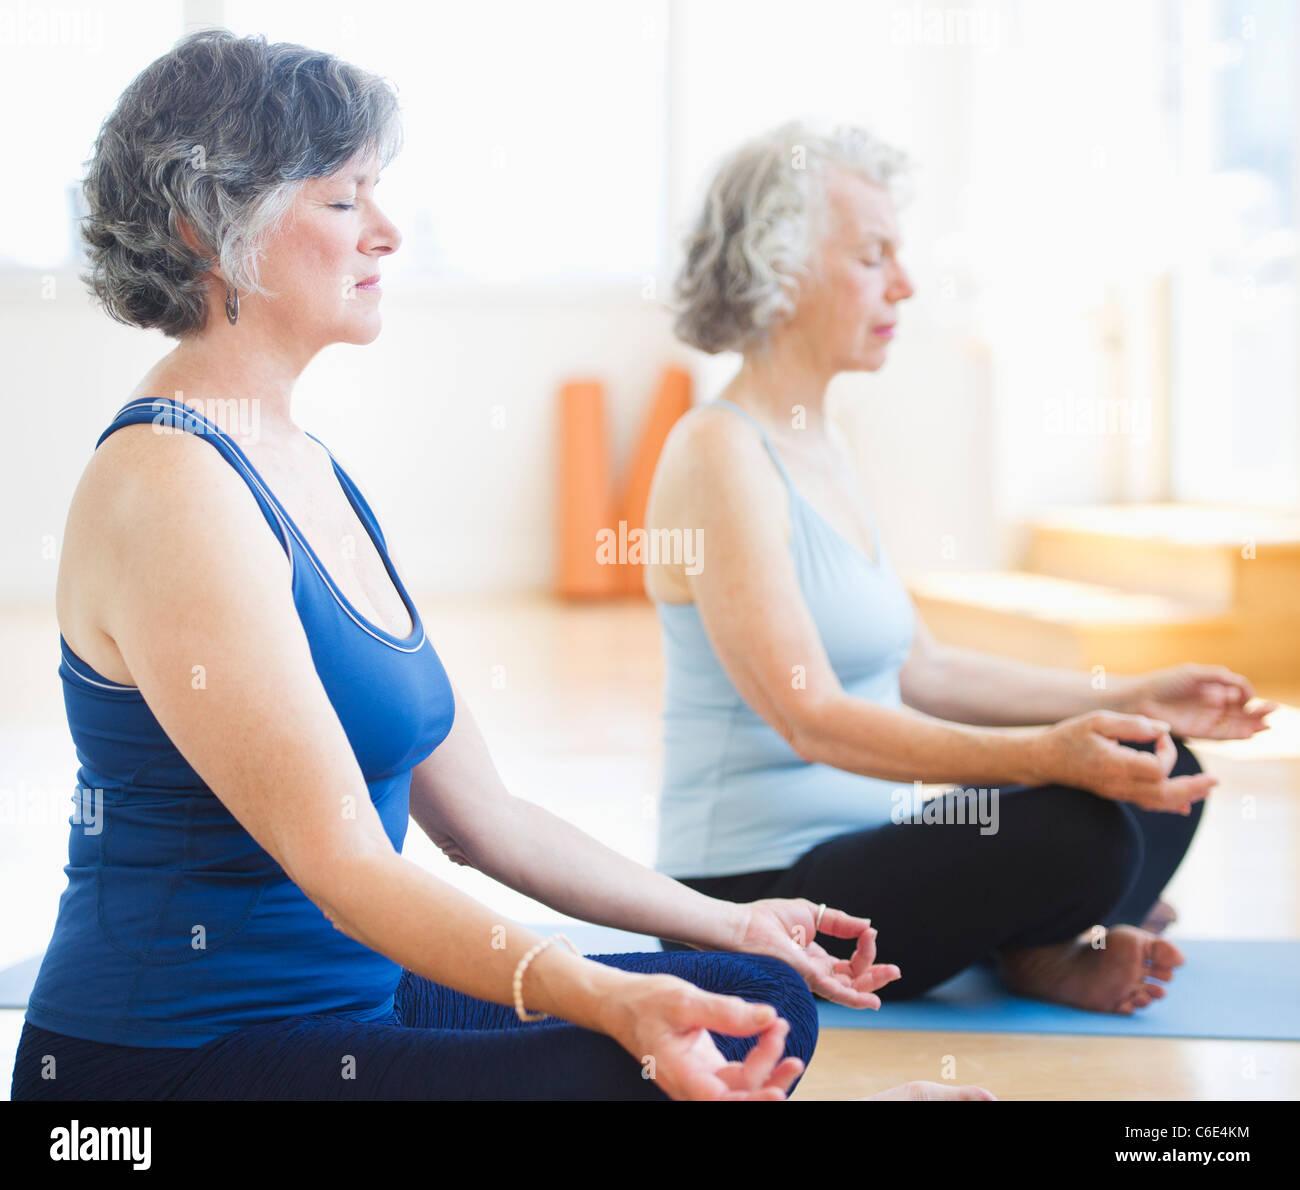 USA, New Jersey, Jersey City, zwei alte Frauen, Yoga zu praktizieren Stockfoto